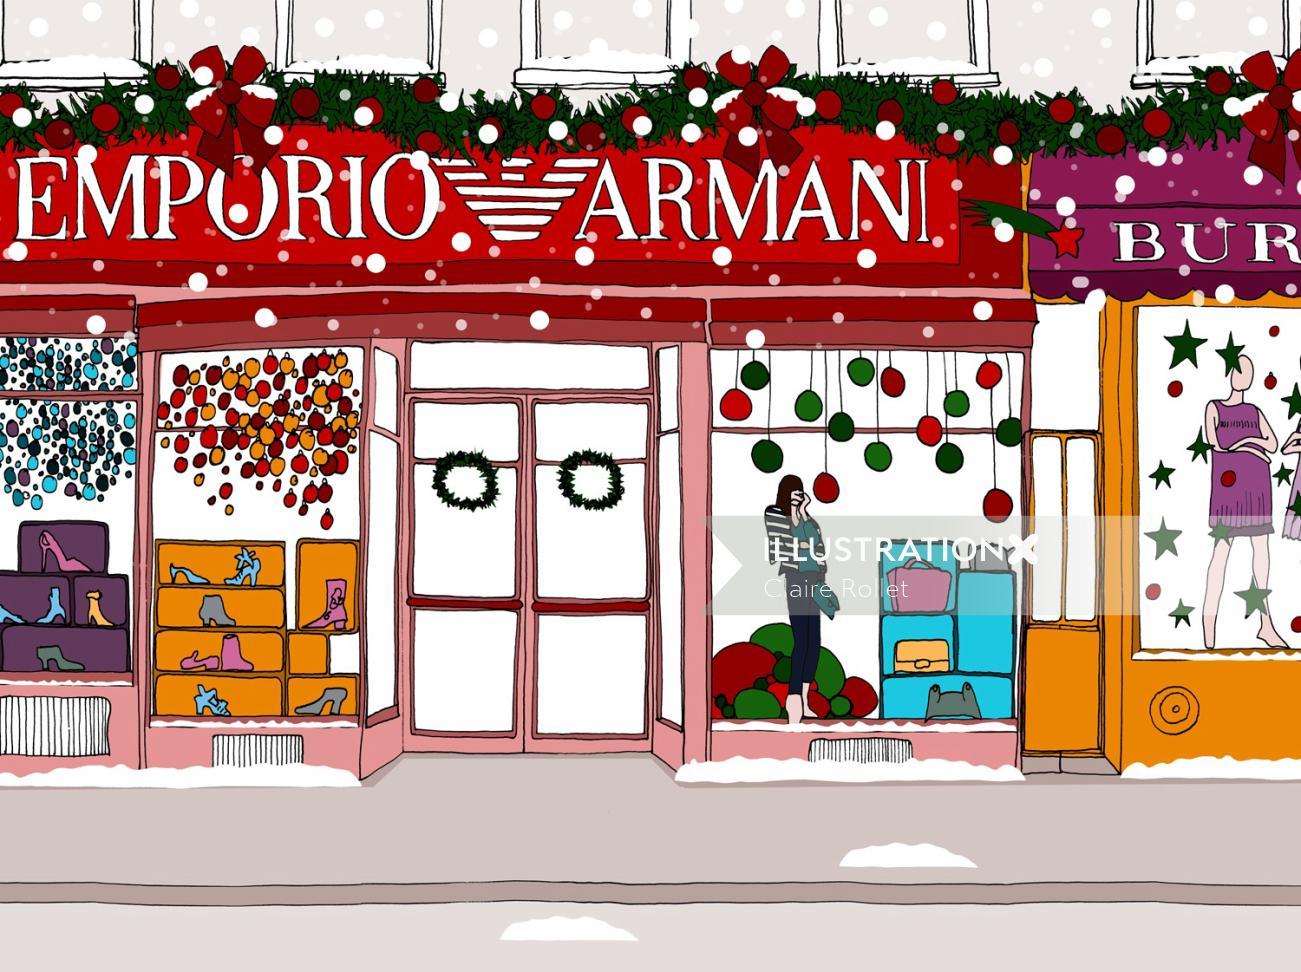 Emporio Armani showroom line illustration